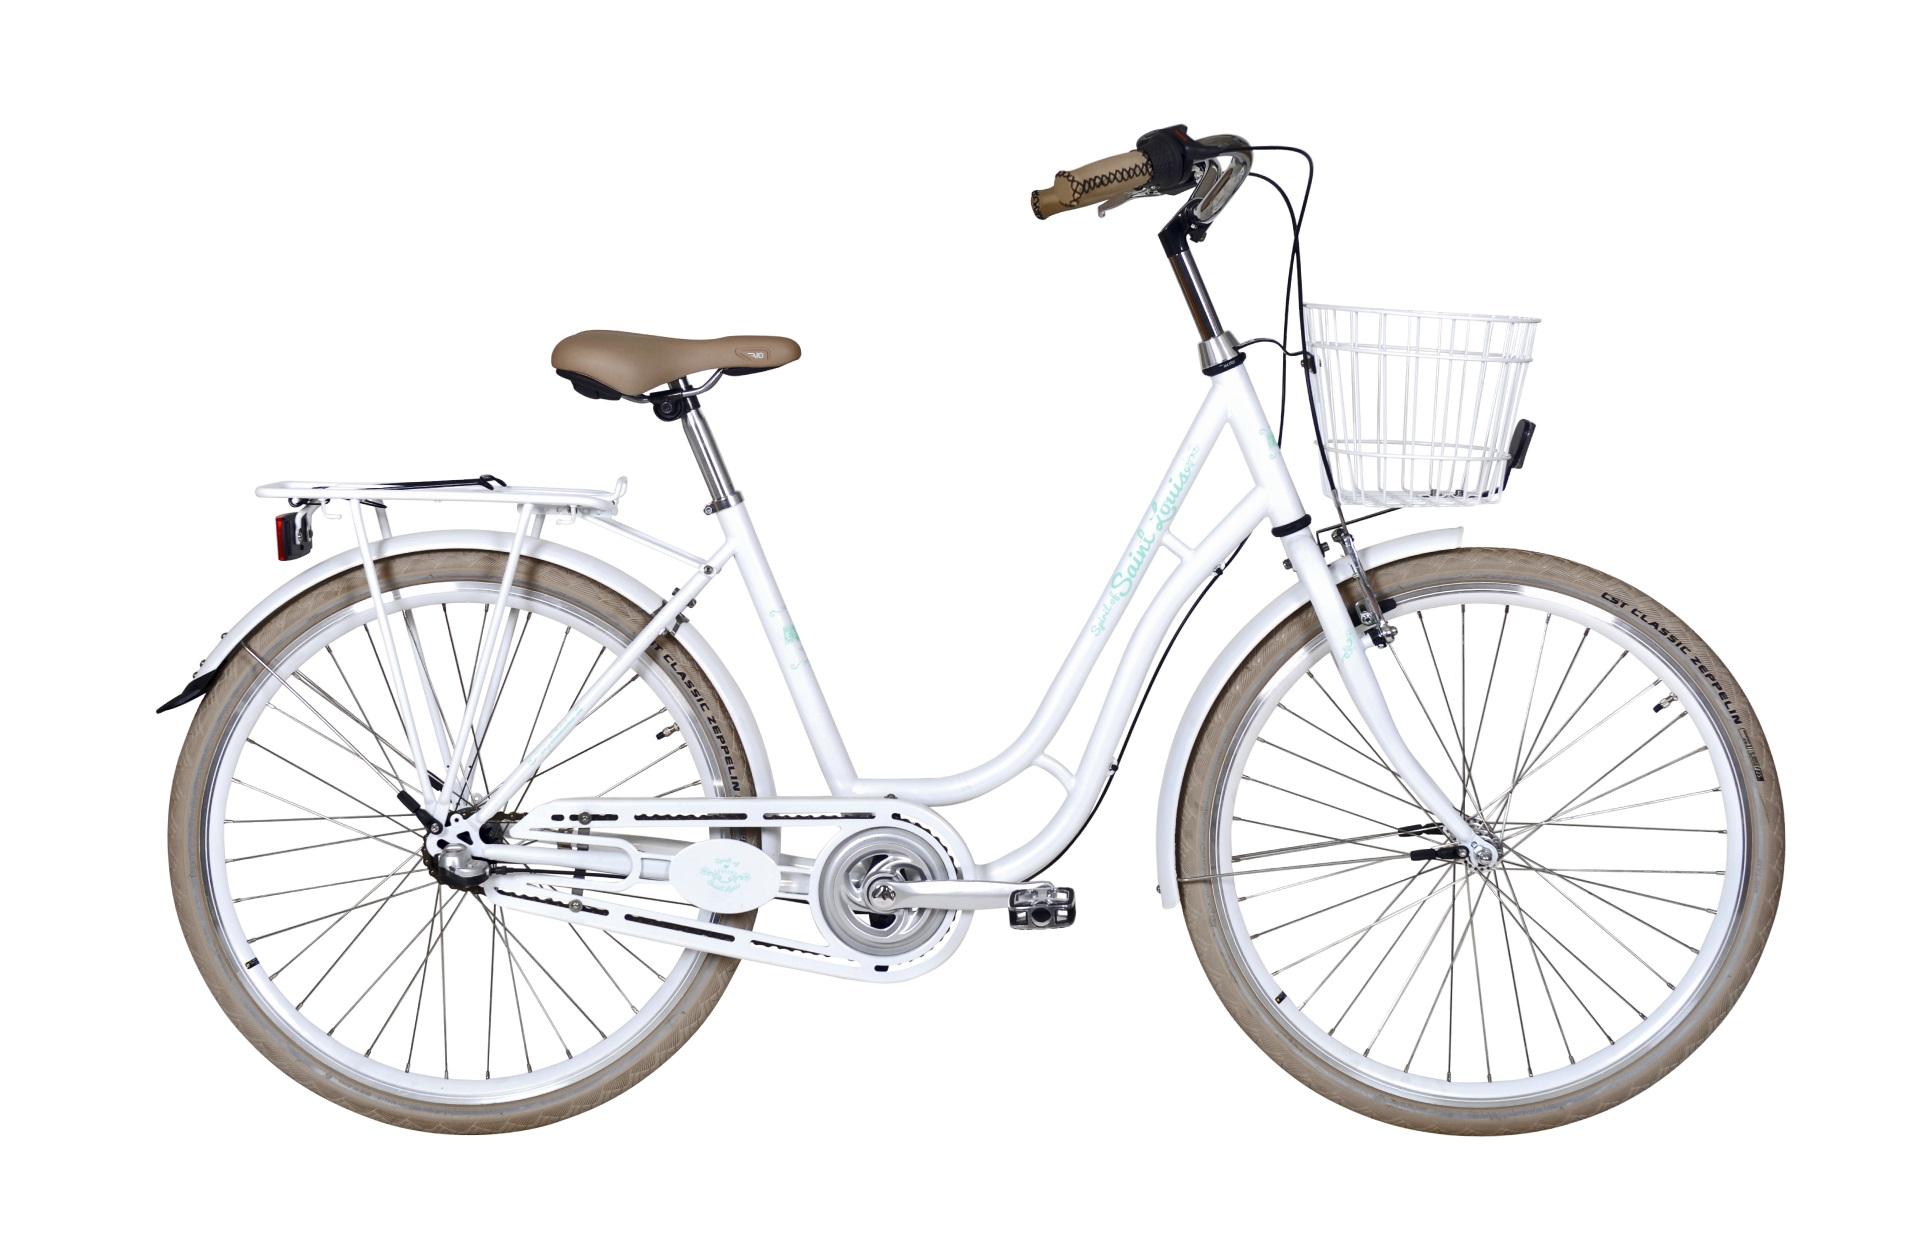 "Ebsen Spirit Of St. Louis 26"" Pige Hvid 3 Gear - 2019 Cykler"